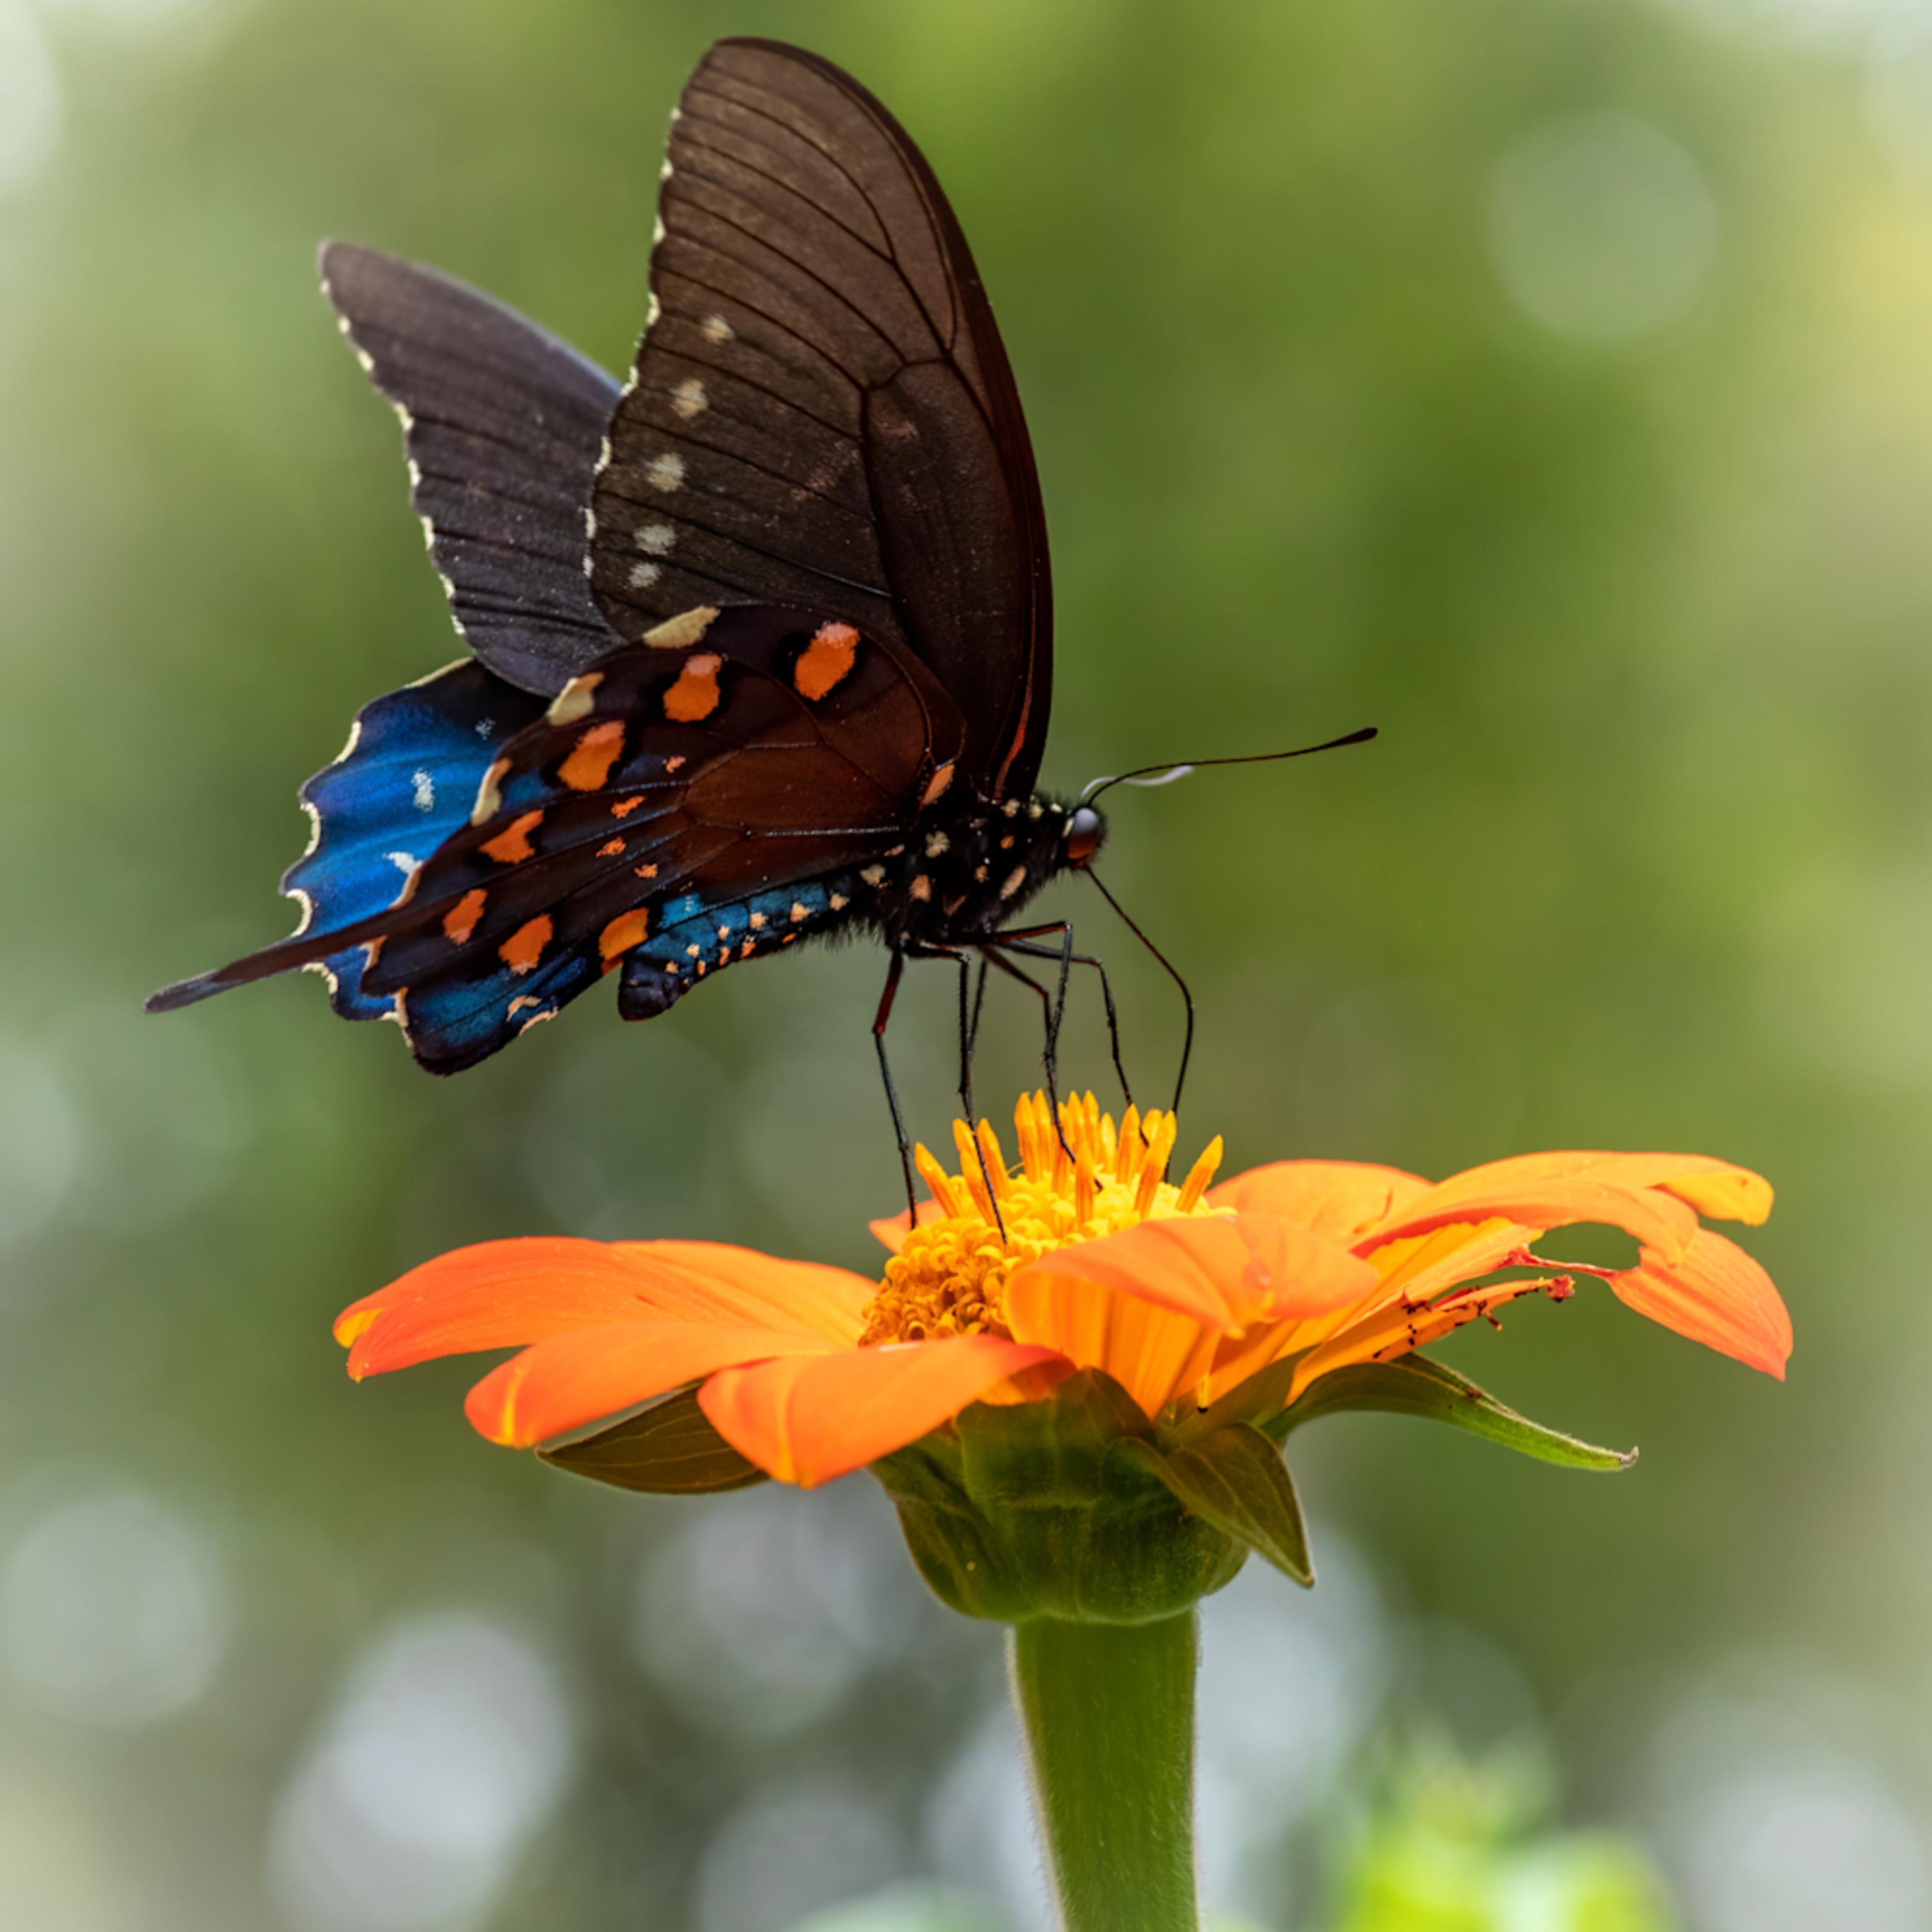 Spicebush swalowtail butterfly ogt1va